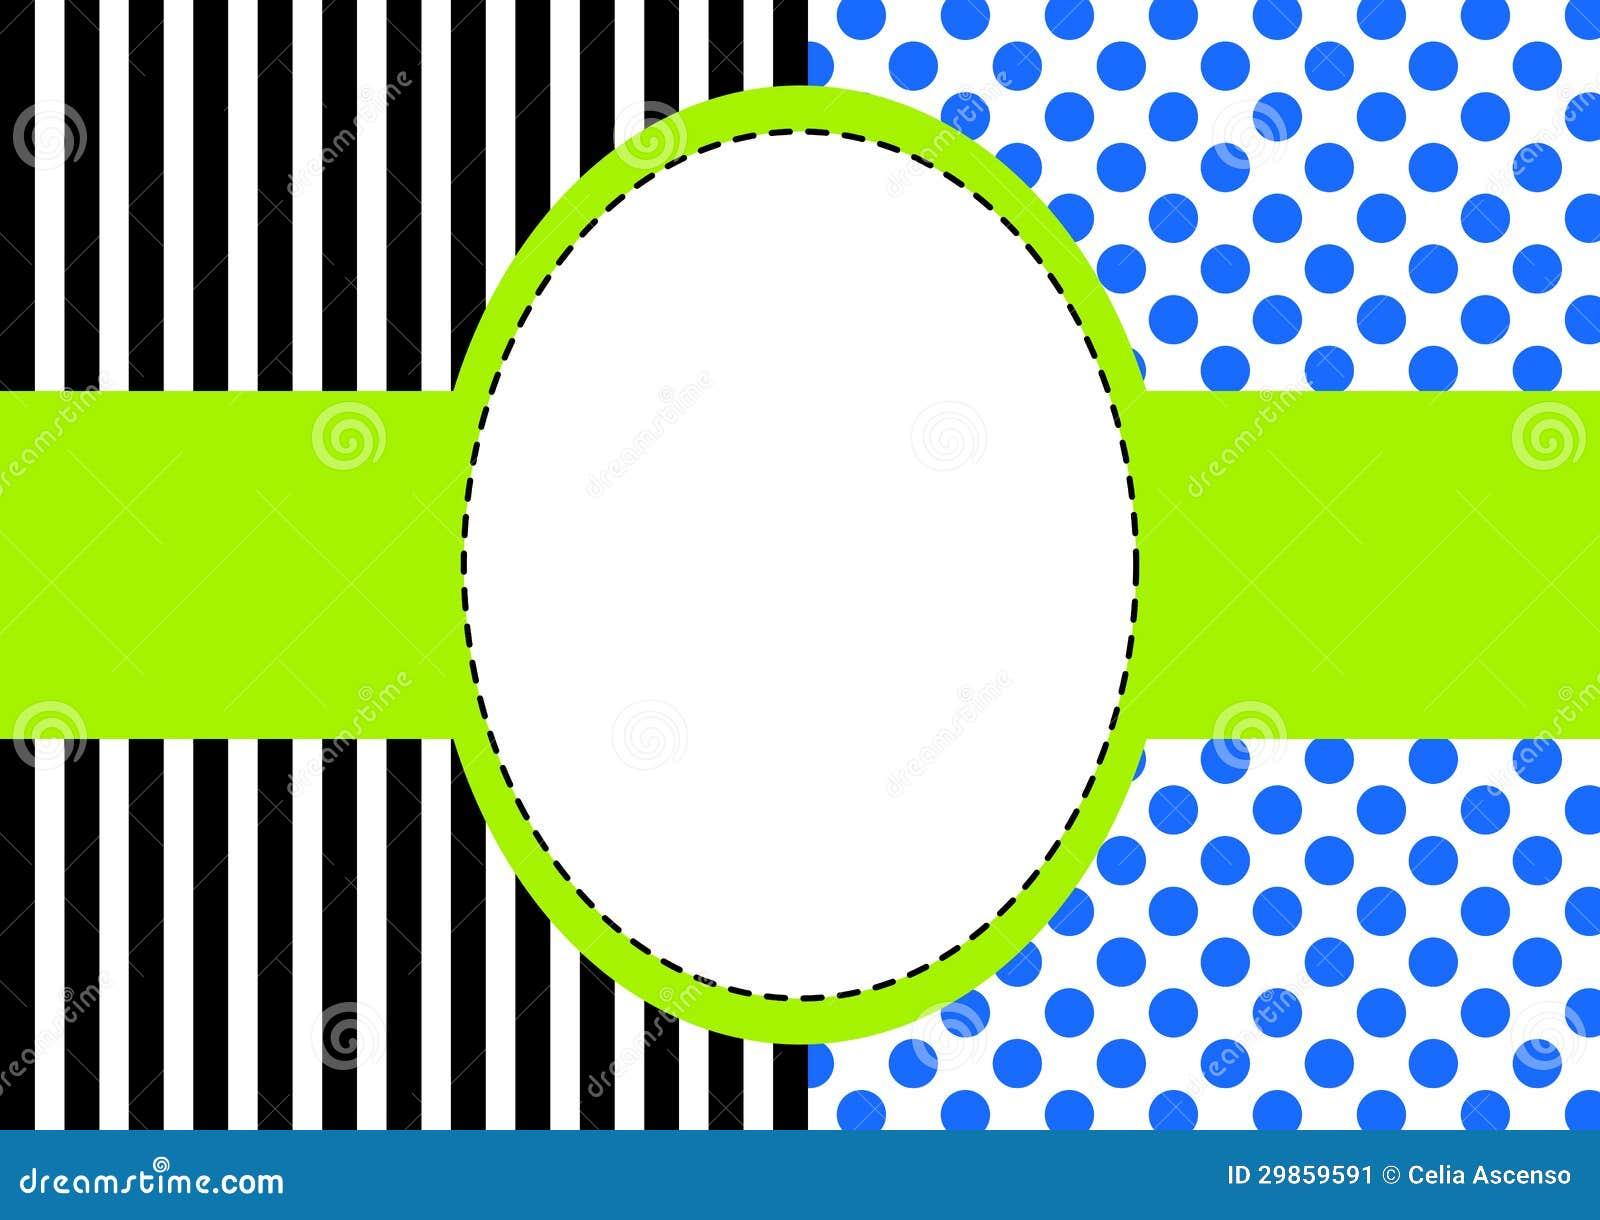 Polka Dots And Stripes Frame Stock Image Image 29859591